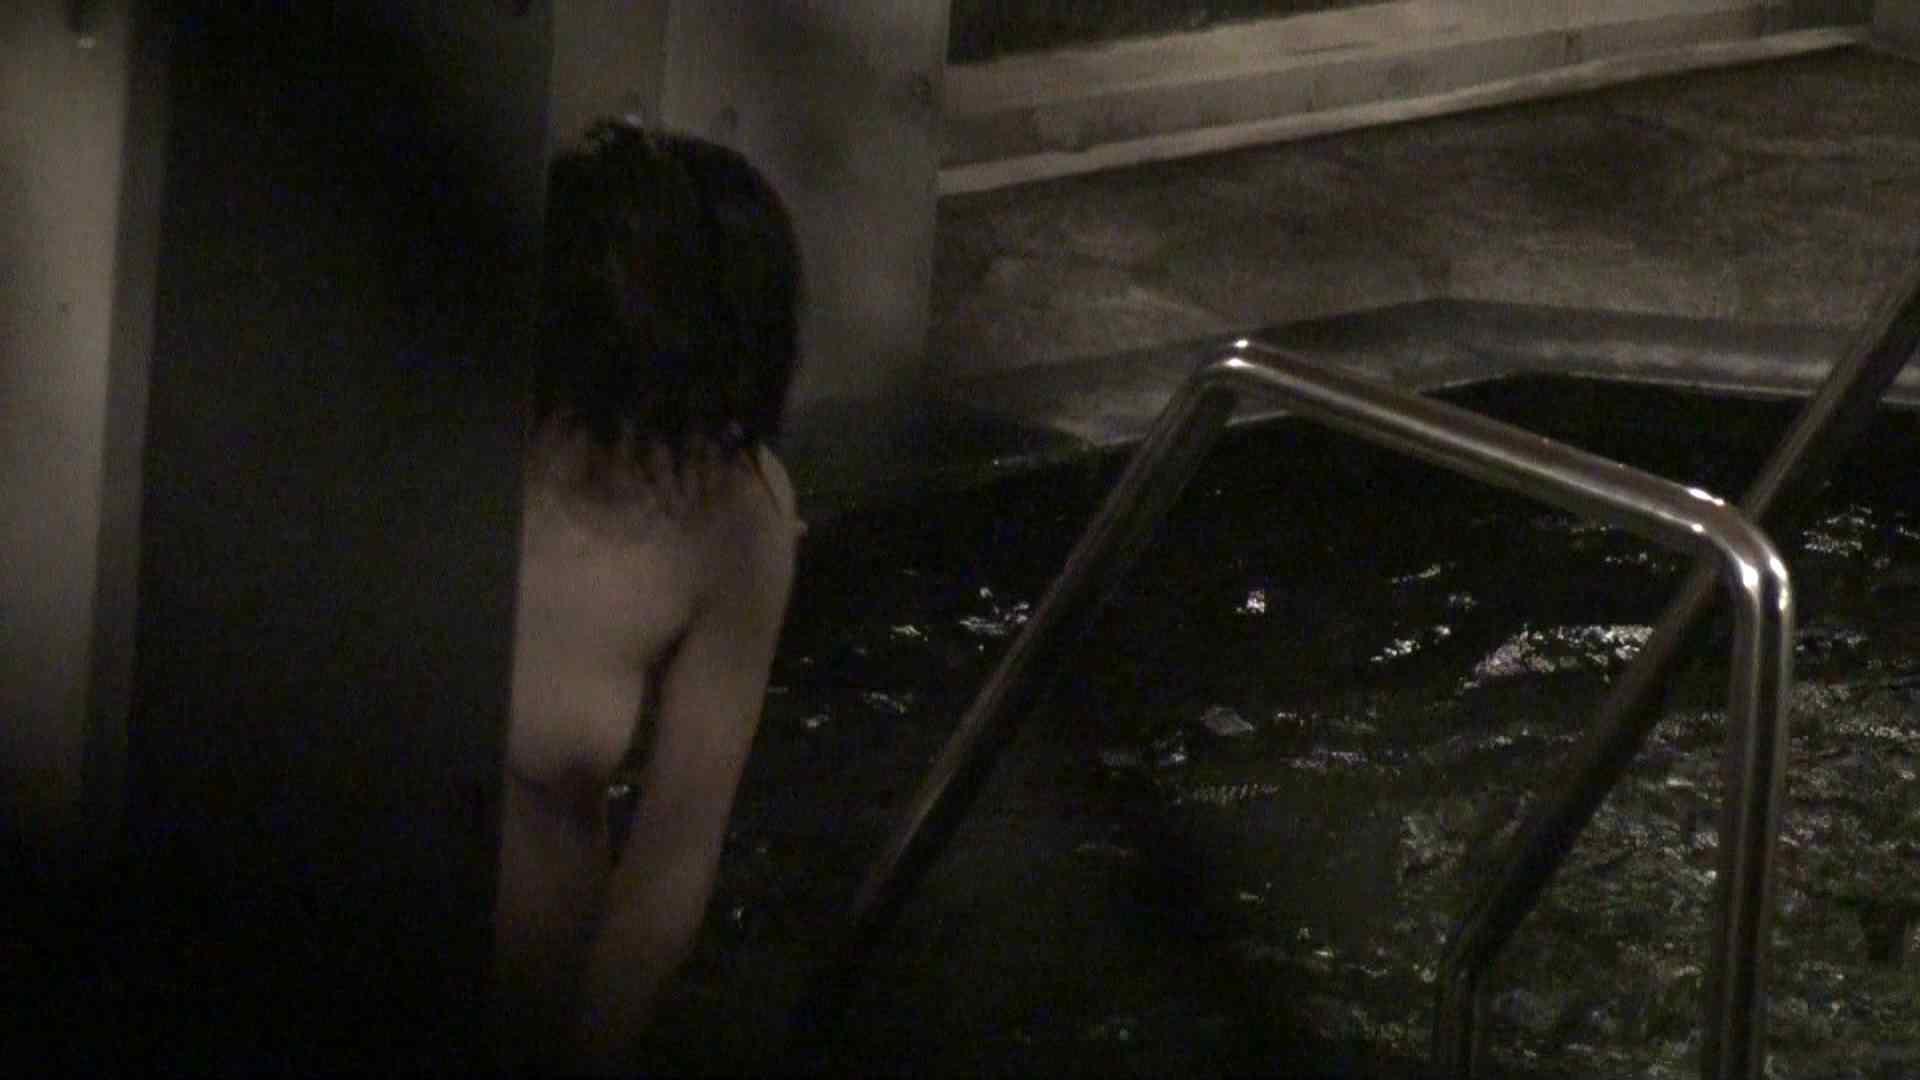 Aquaな露天風呂Vol.357 盗撮師作品 | 露天風呂突入  79pic 55